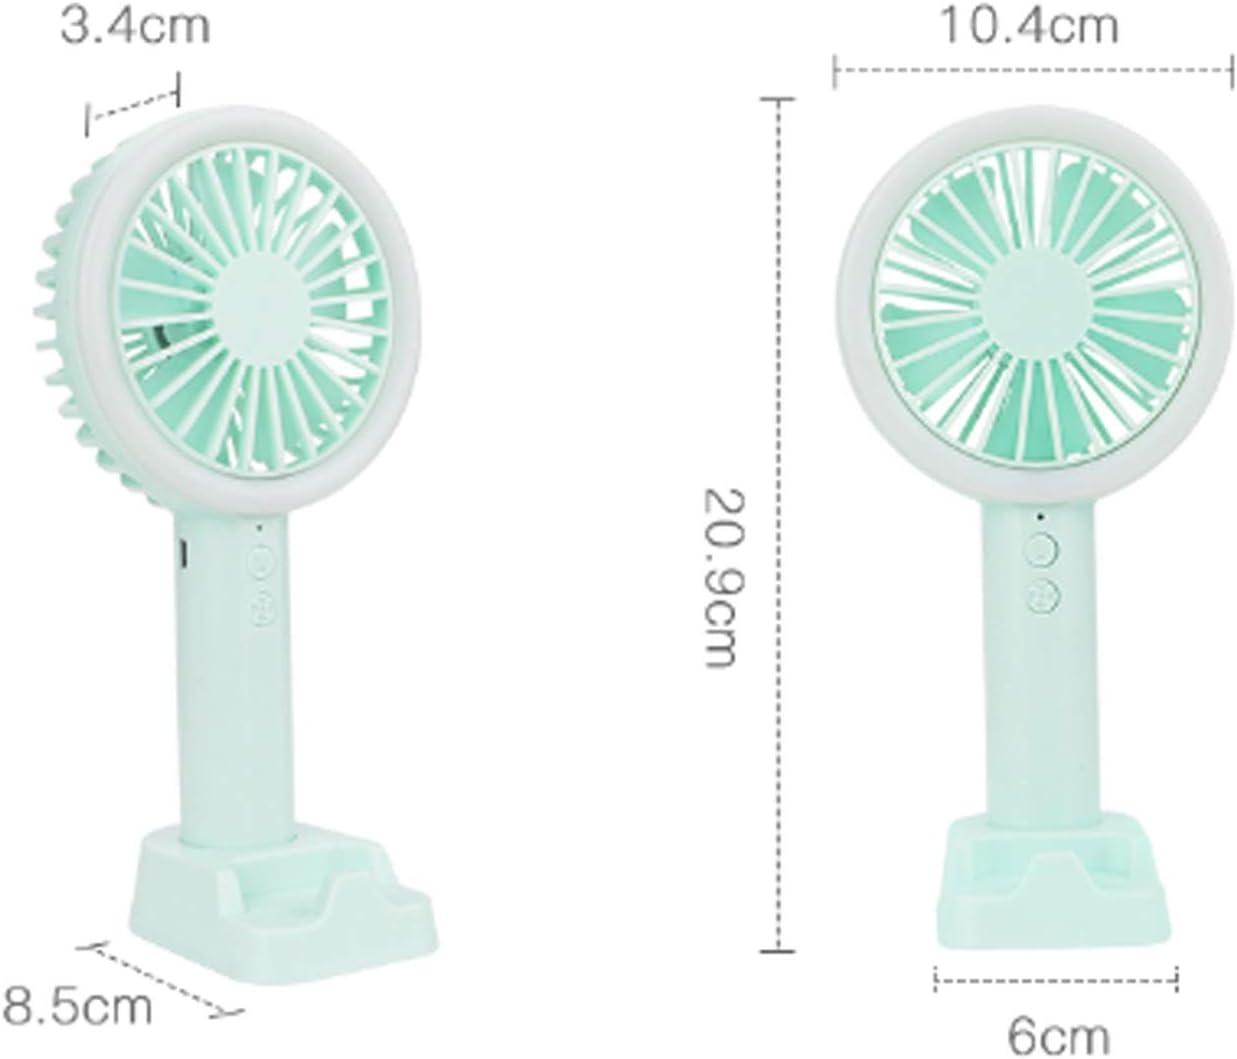 Color : White Convenient Handheld Electric Fan USB Rechargeable Cellphone Stand Holder LED Light Cooler Portable 3 Speed Adjustable Desktop Cooling Electric Fan Durable